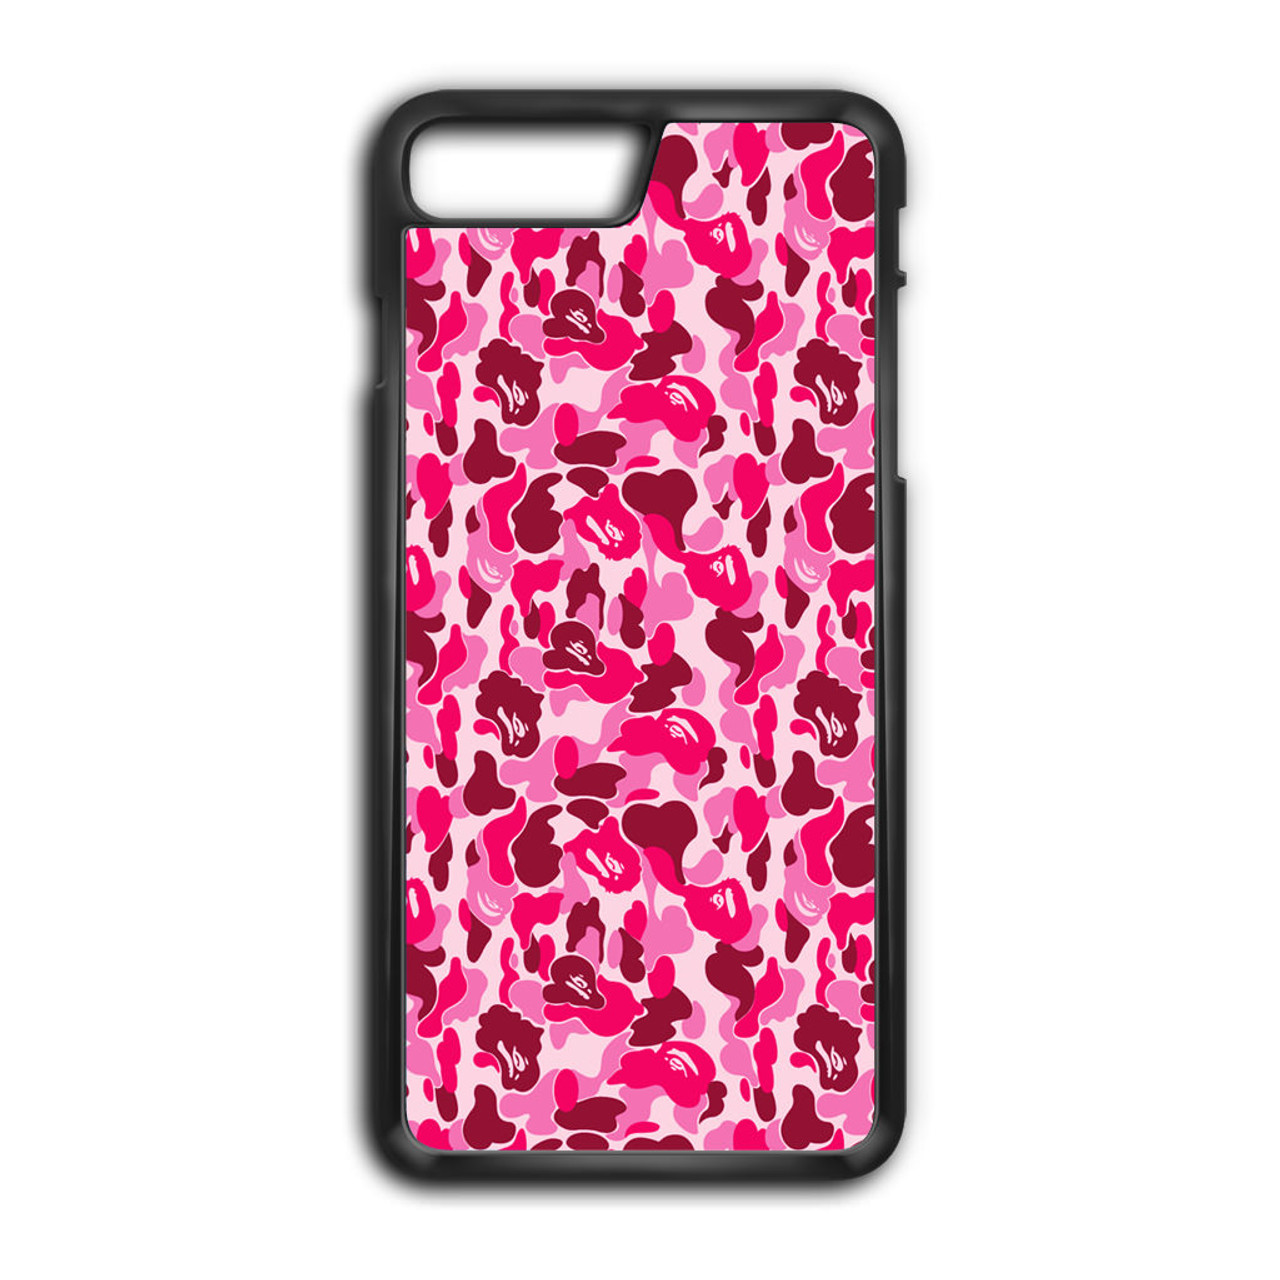 bape iphone 7 case pink